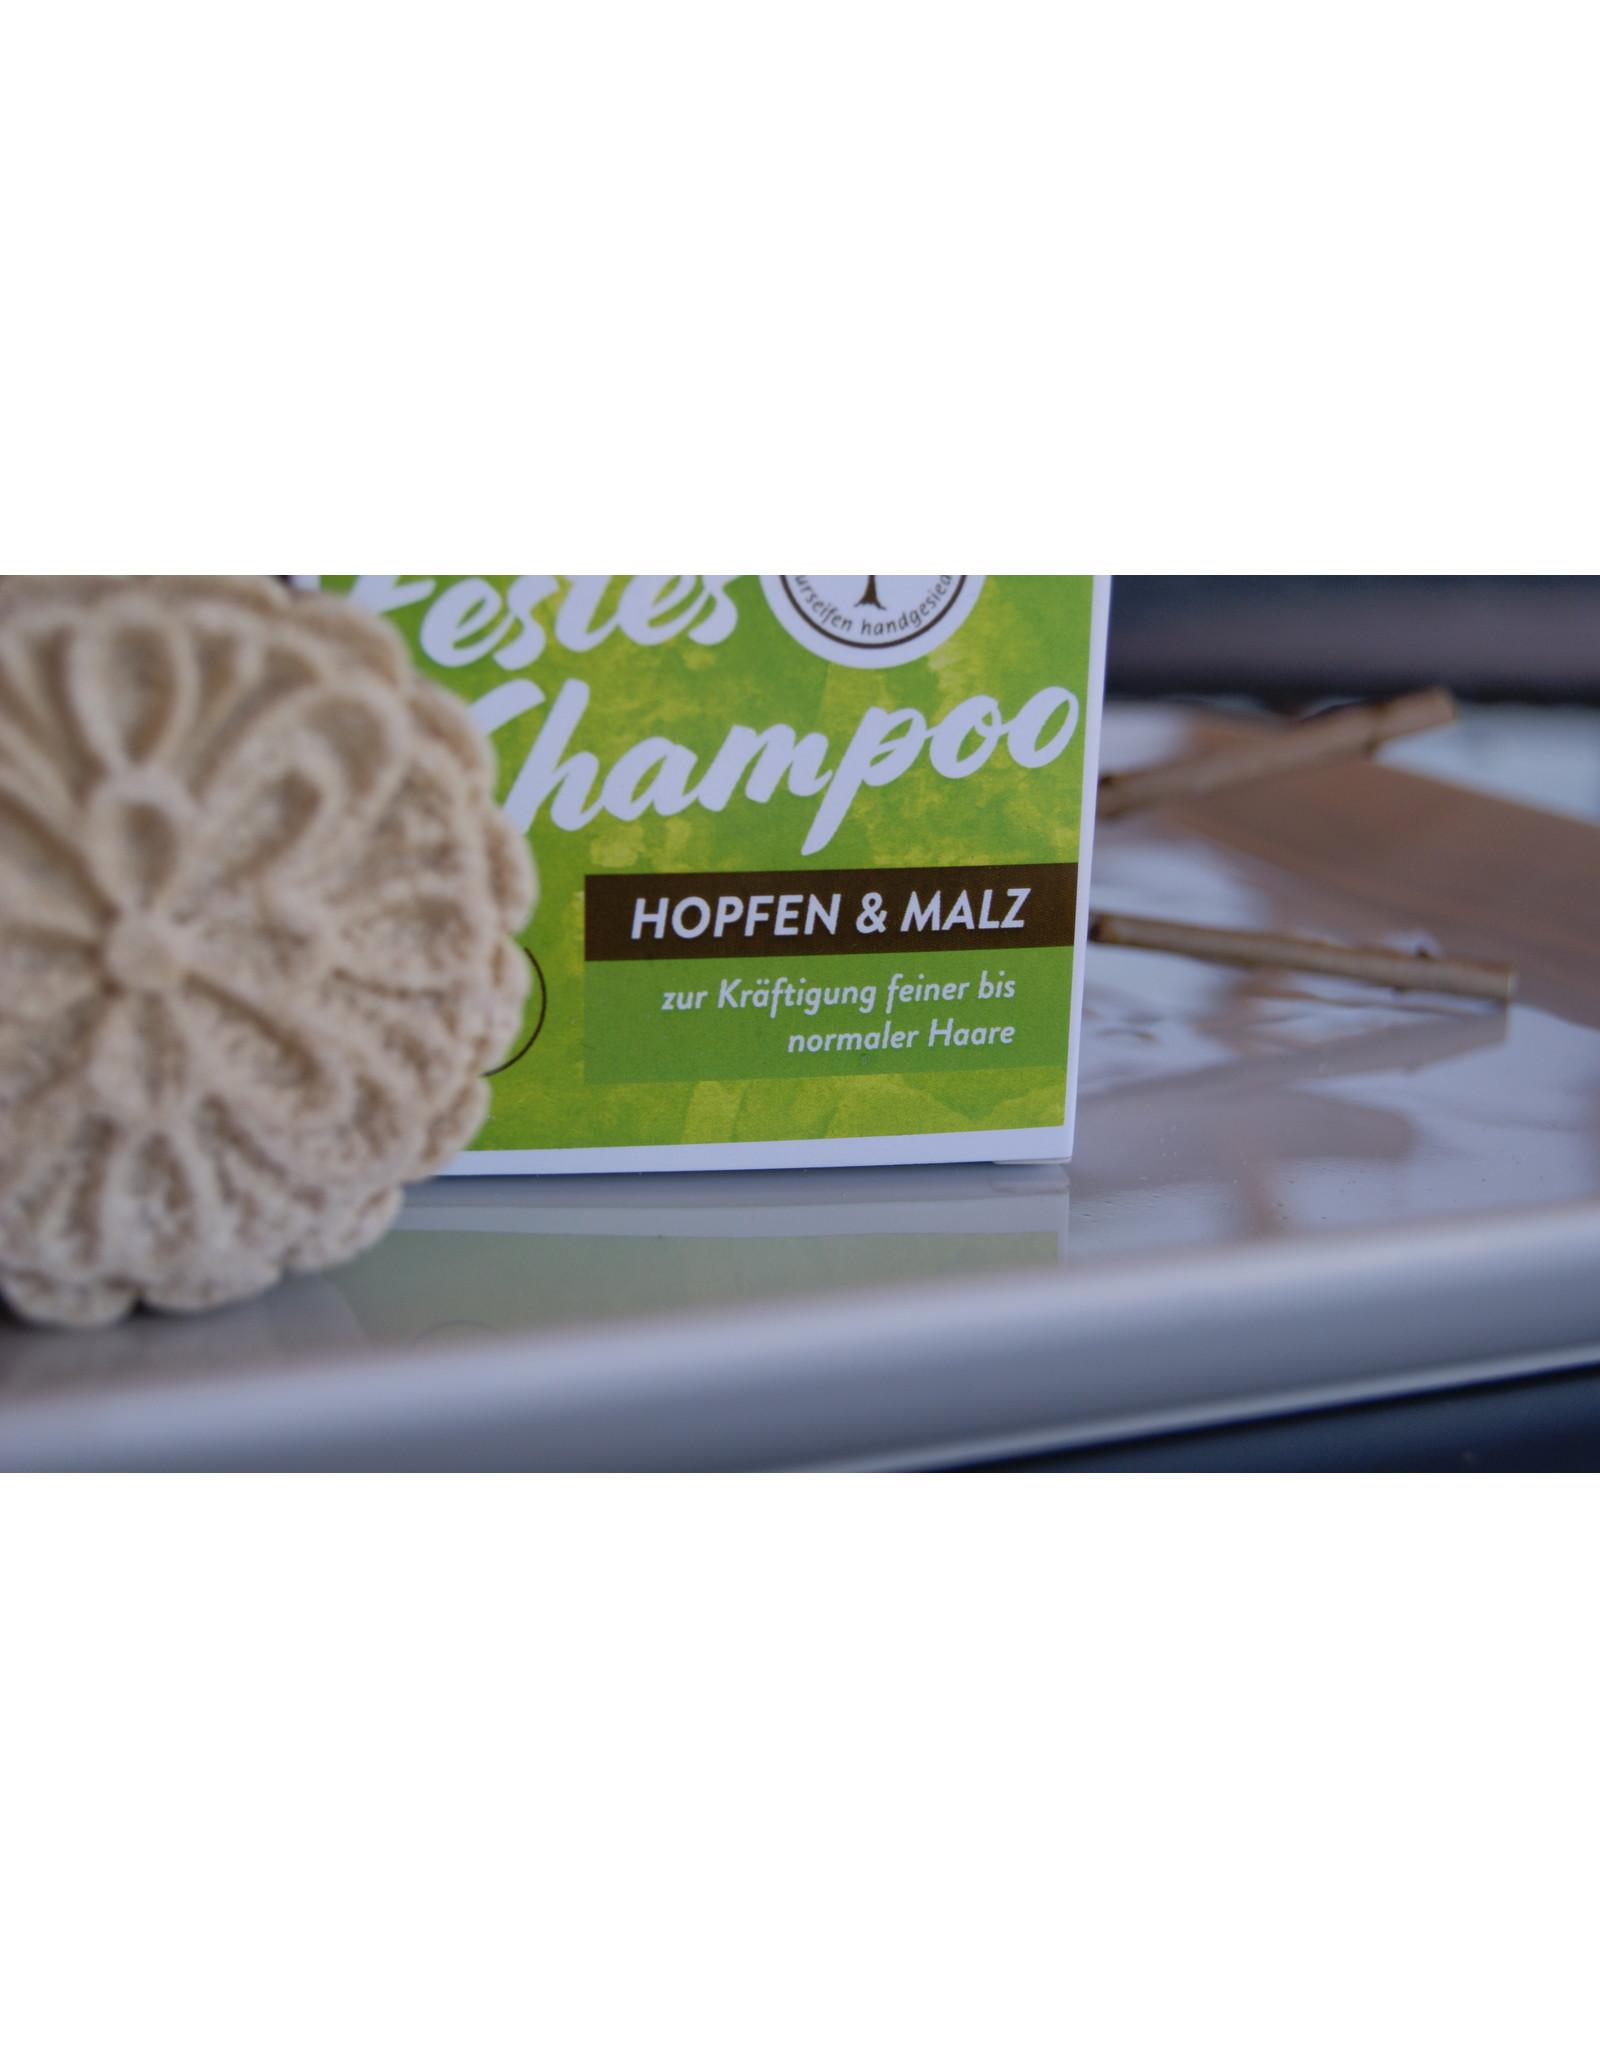 Festes Shampoo Hopfen und Malz